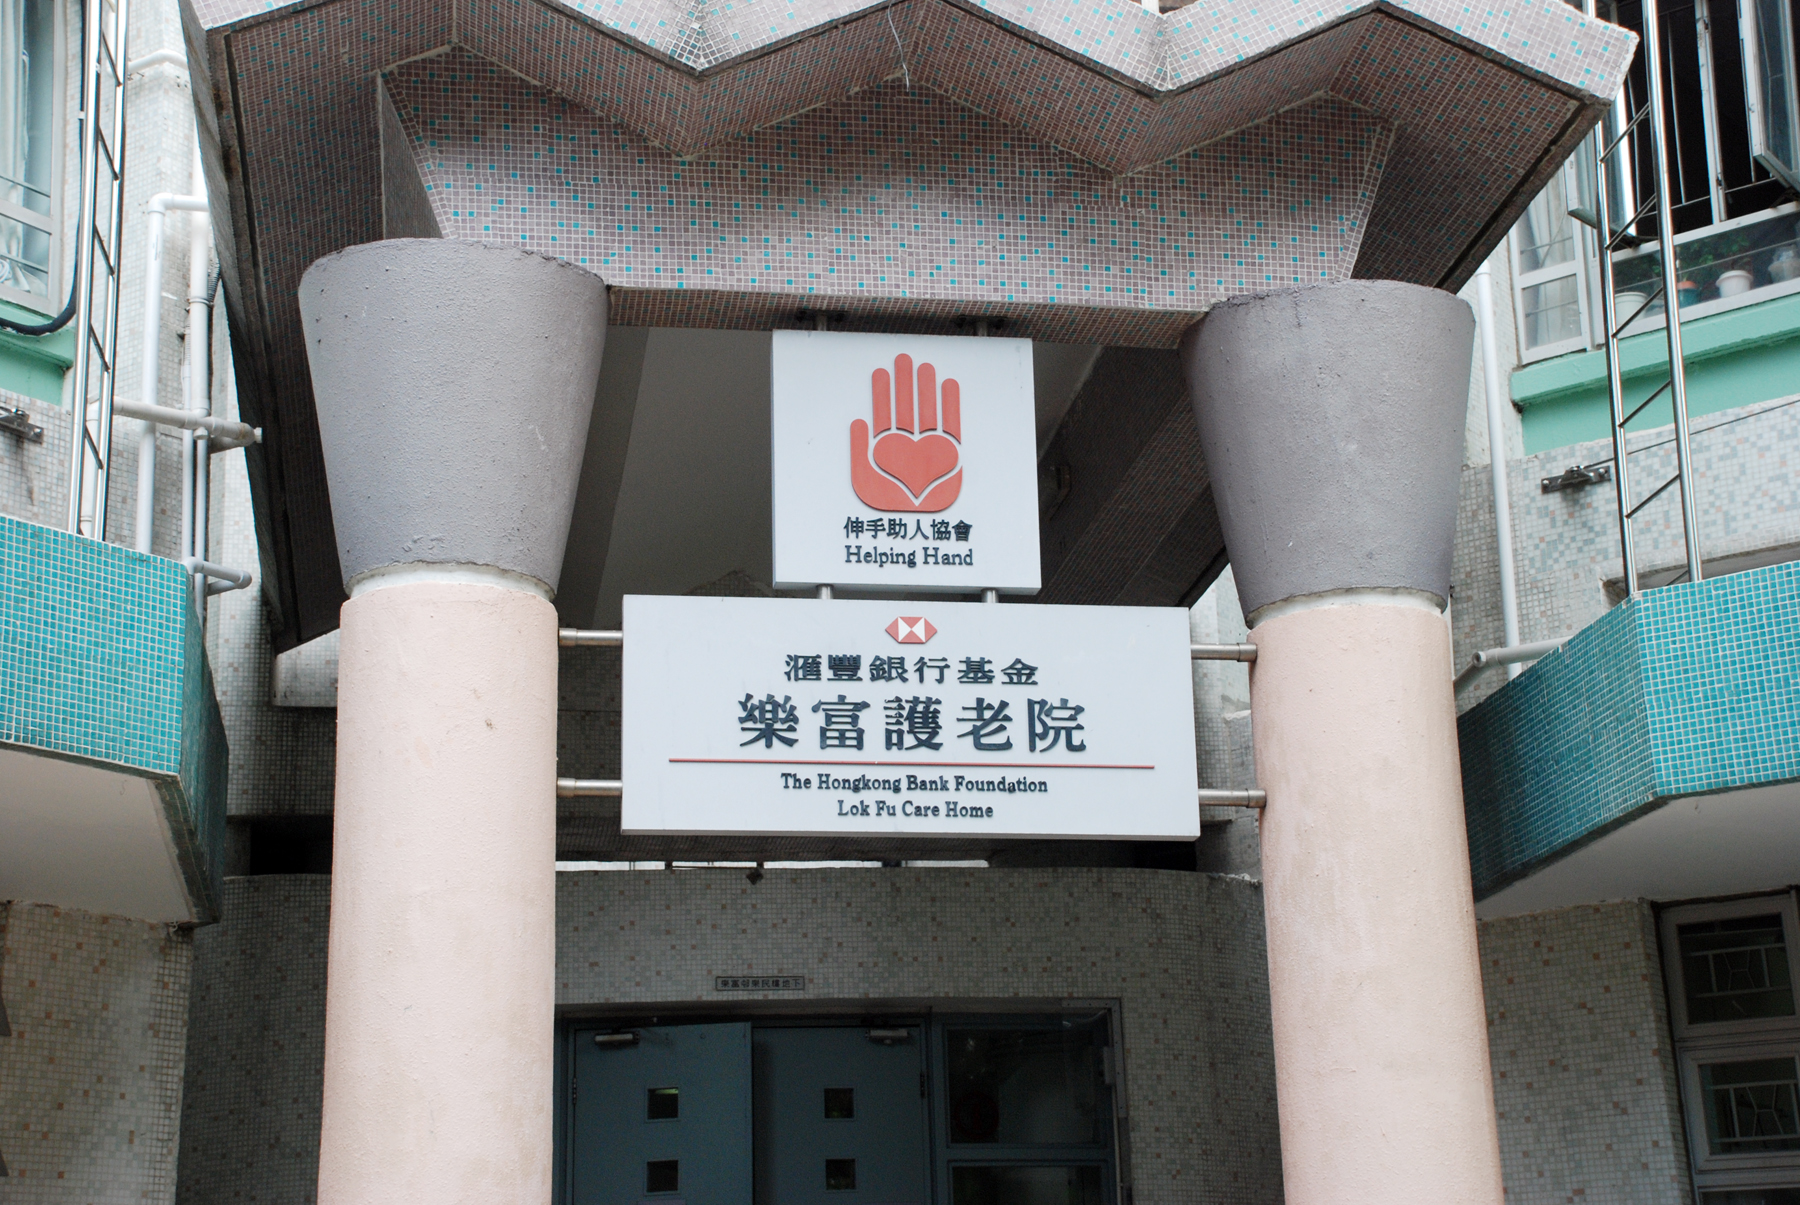 2011 Jun - 护老院作老人探访